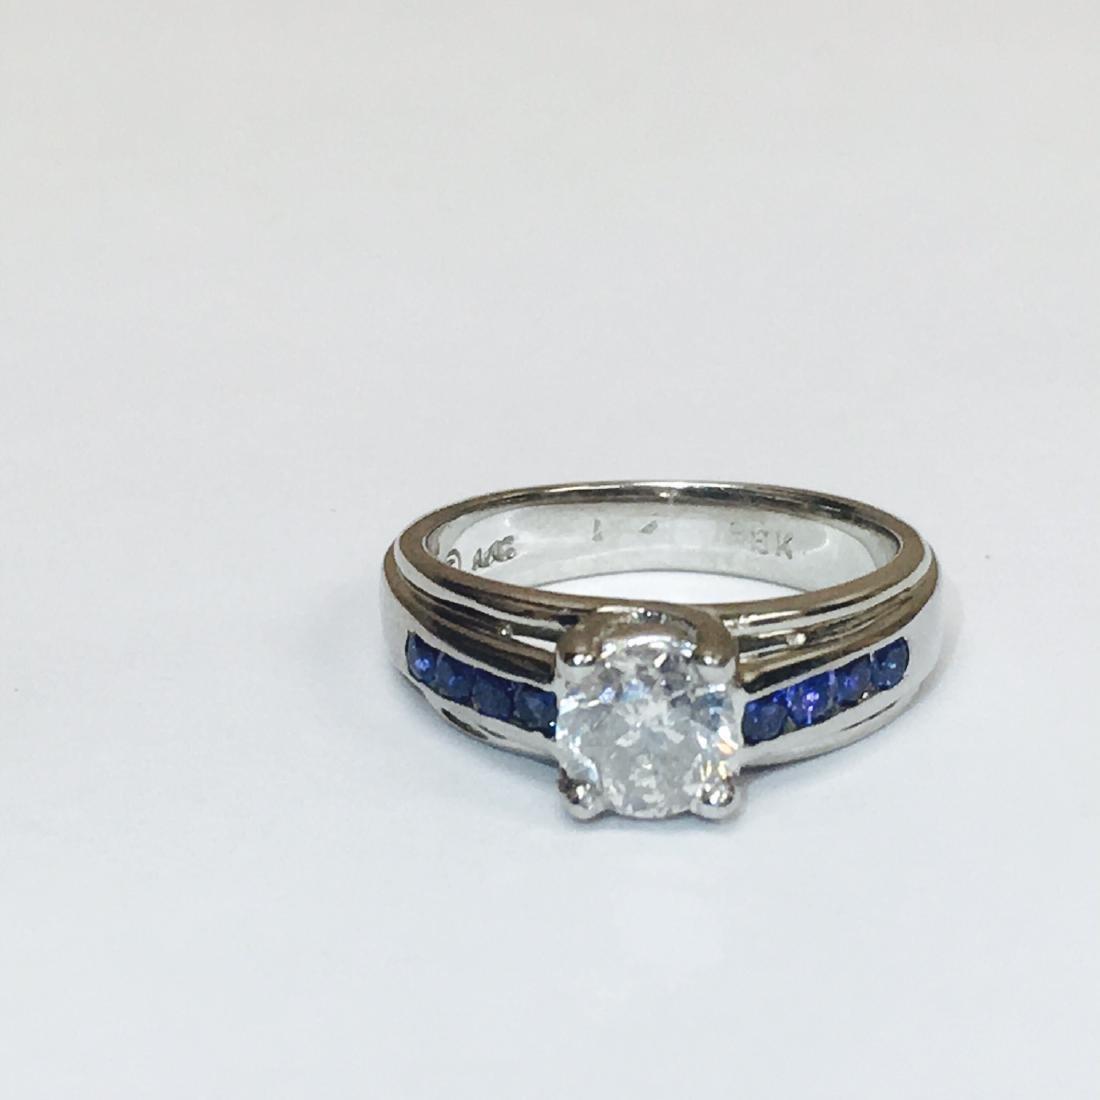 18K, 1.70 Carat Diamond and Blue Sapphire Ring